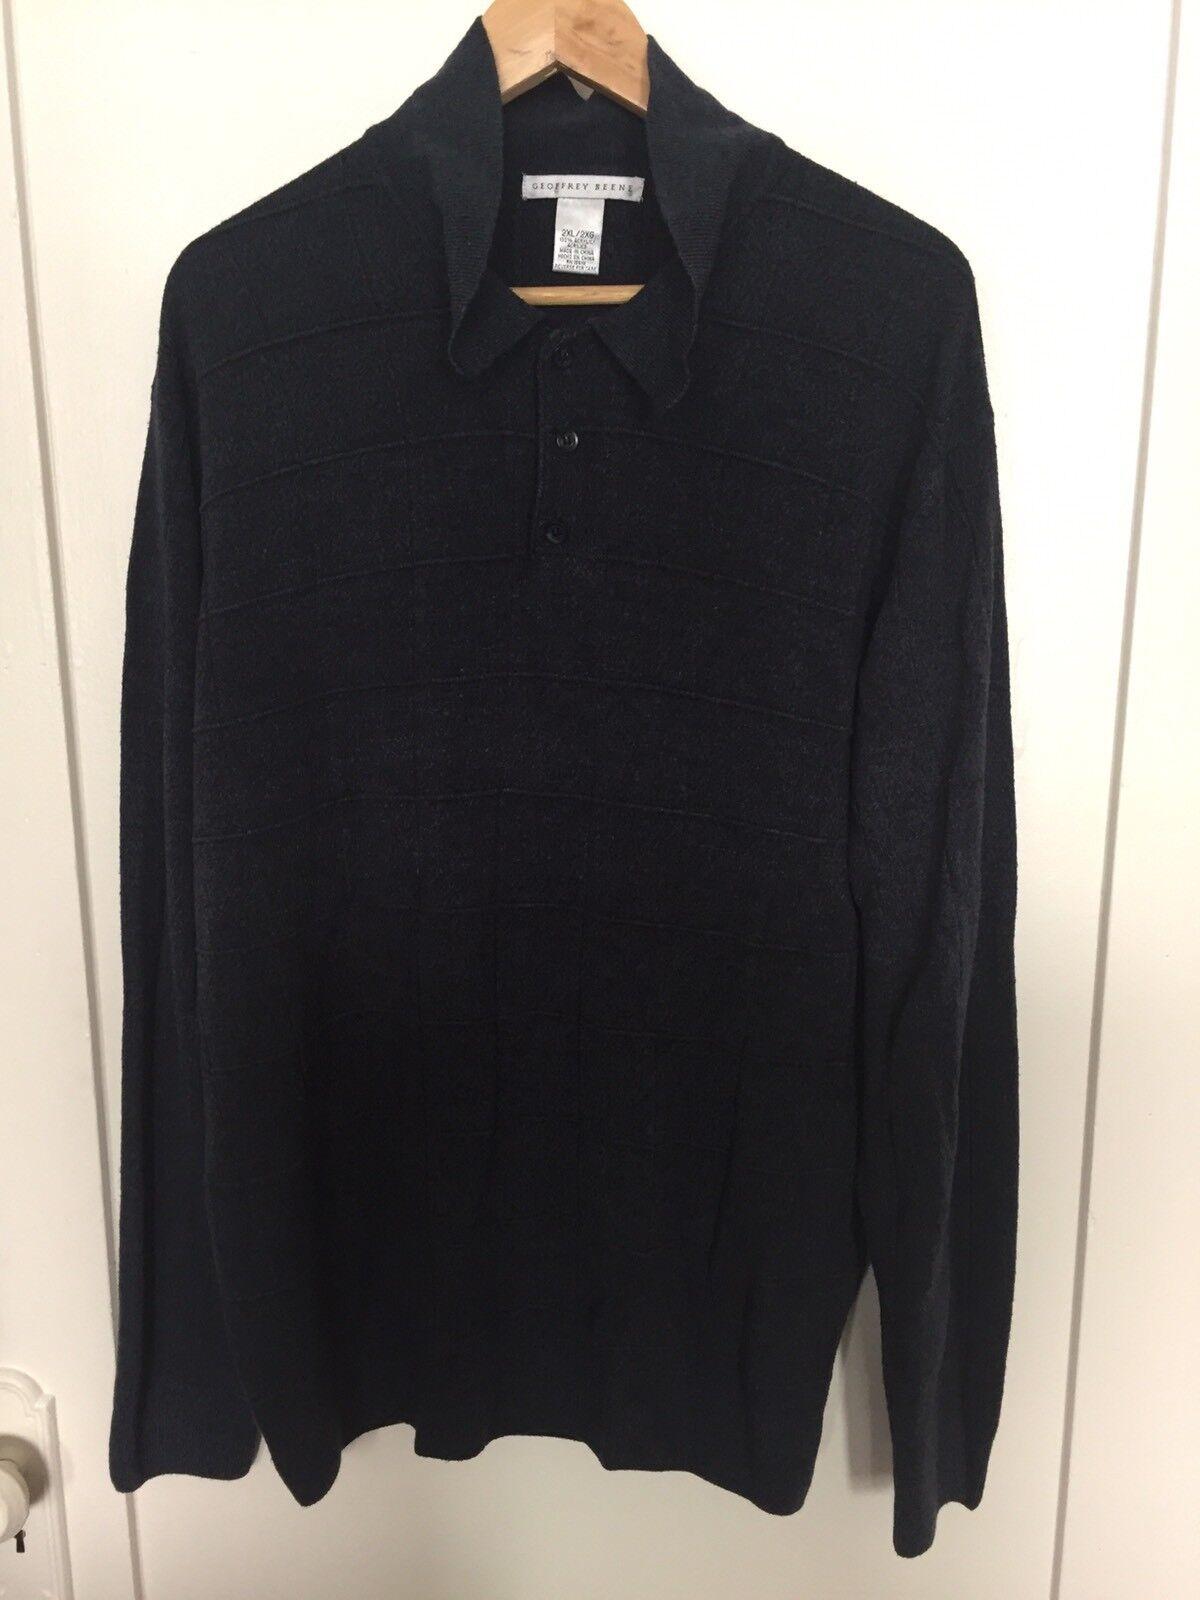 Geoffrey Beene Men's Light Sweater Navy bluee Polo Style Size 2XL- Super Soft